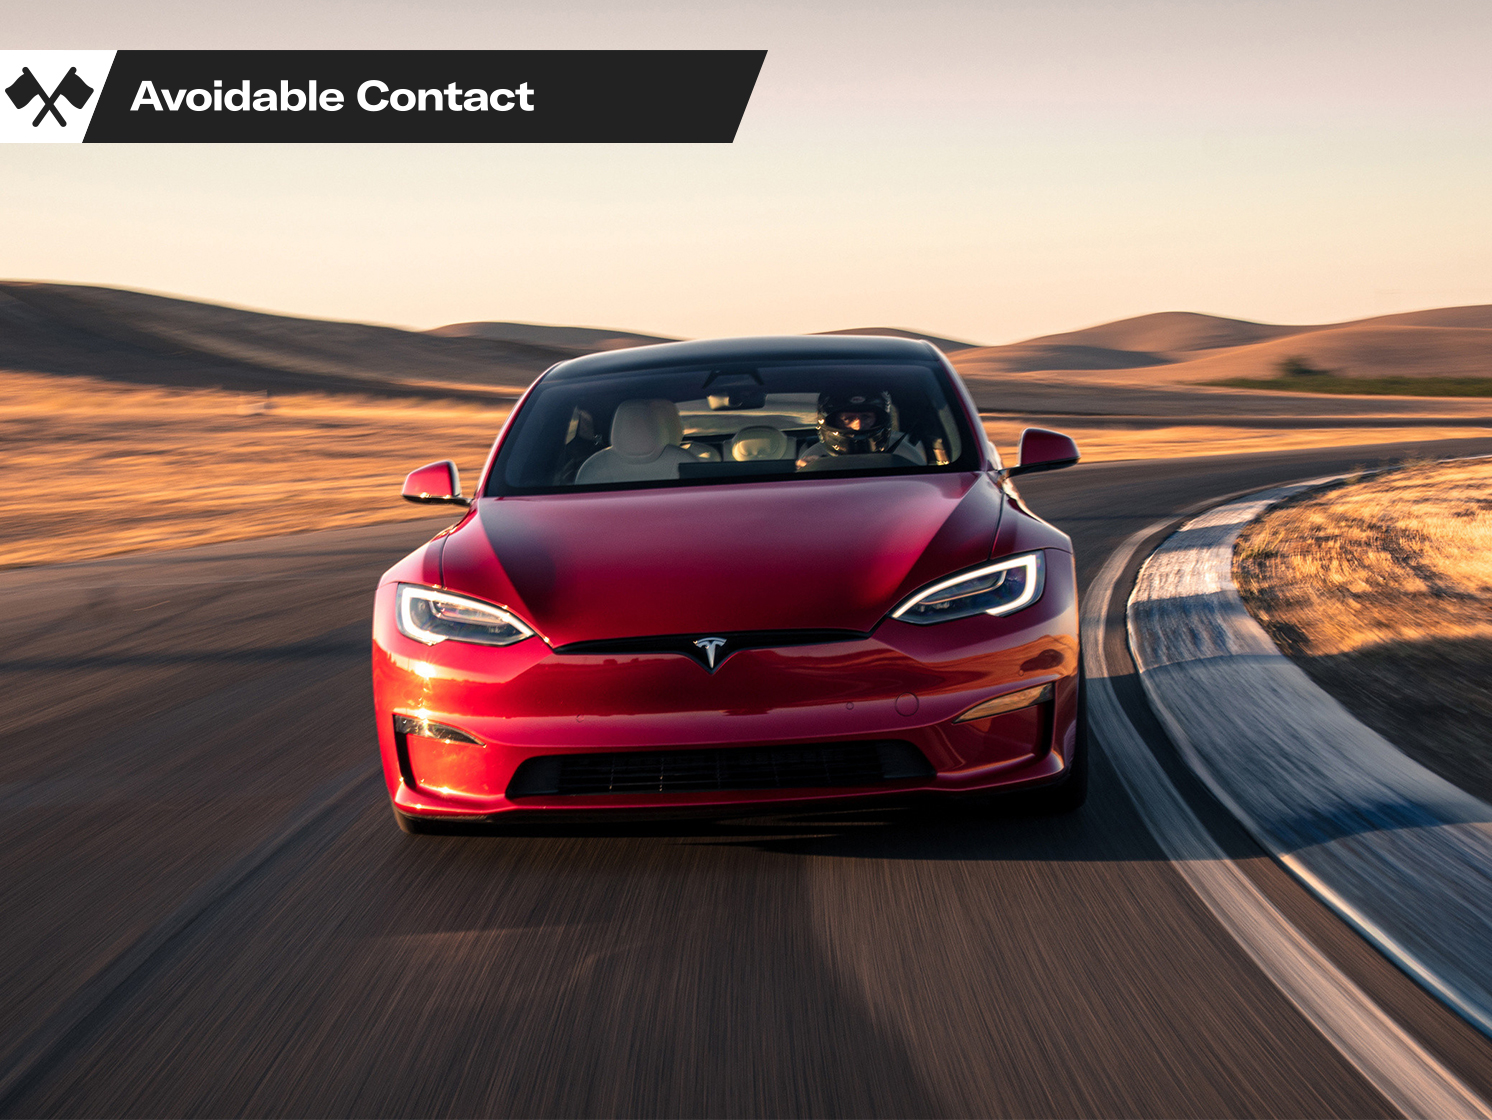 AC_Tesla_Model_S_Plaid_Lede